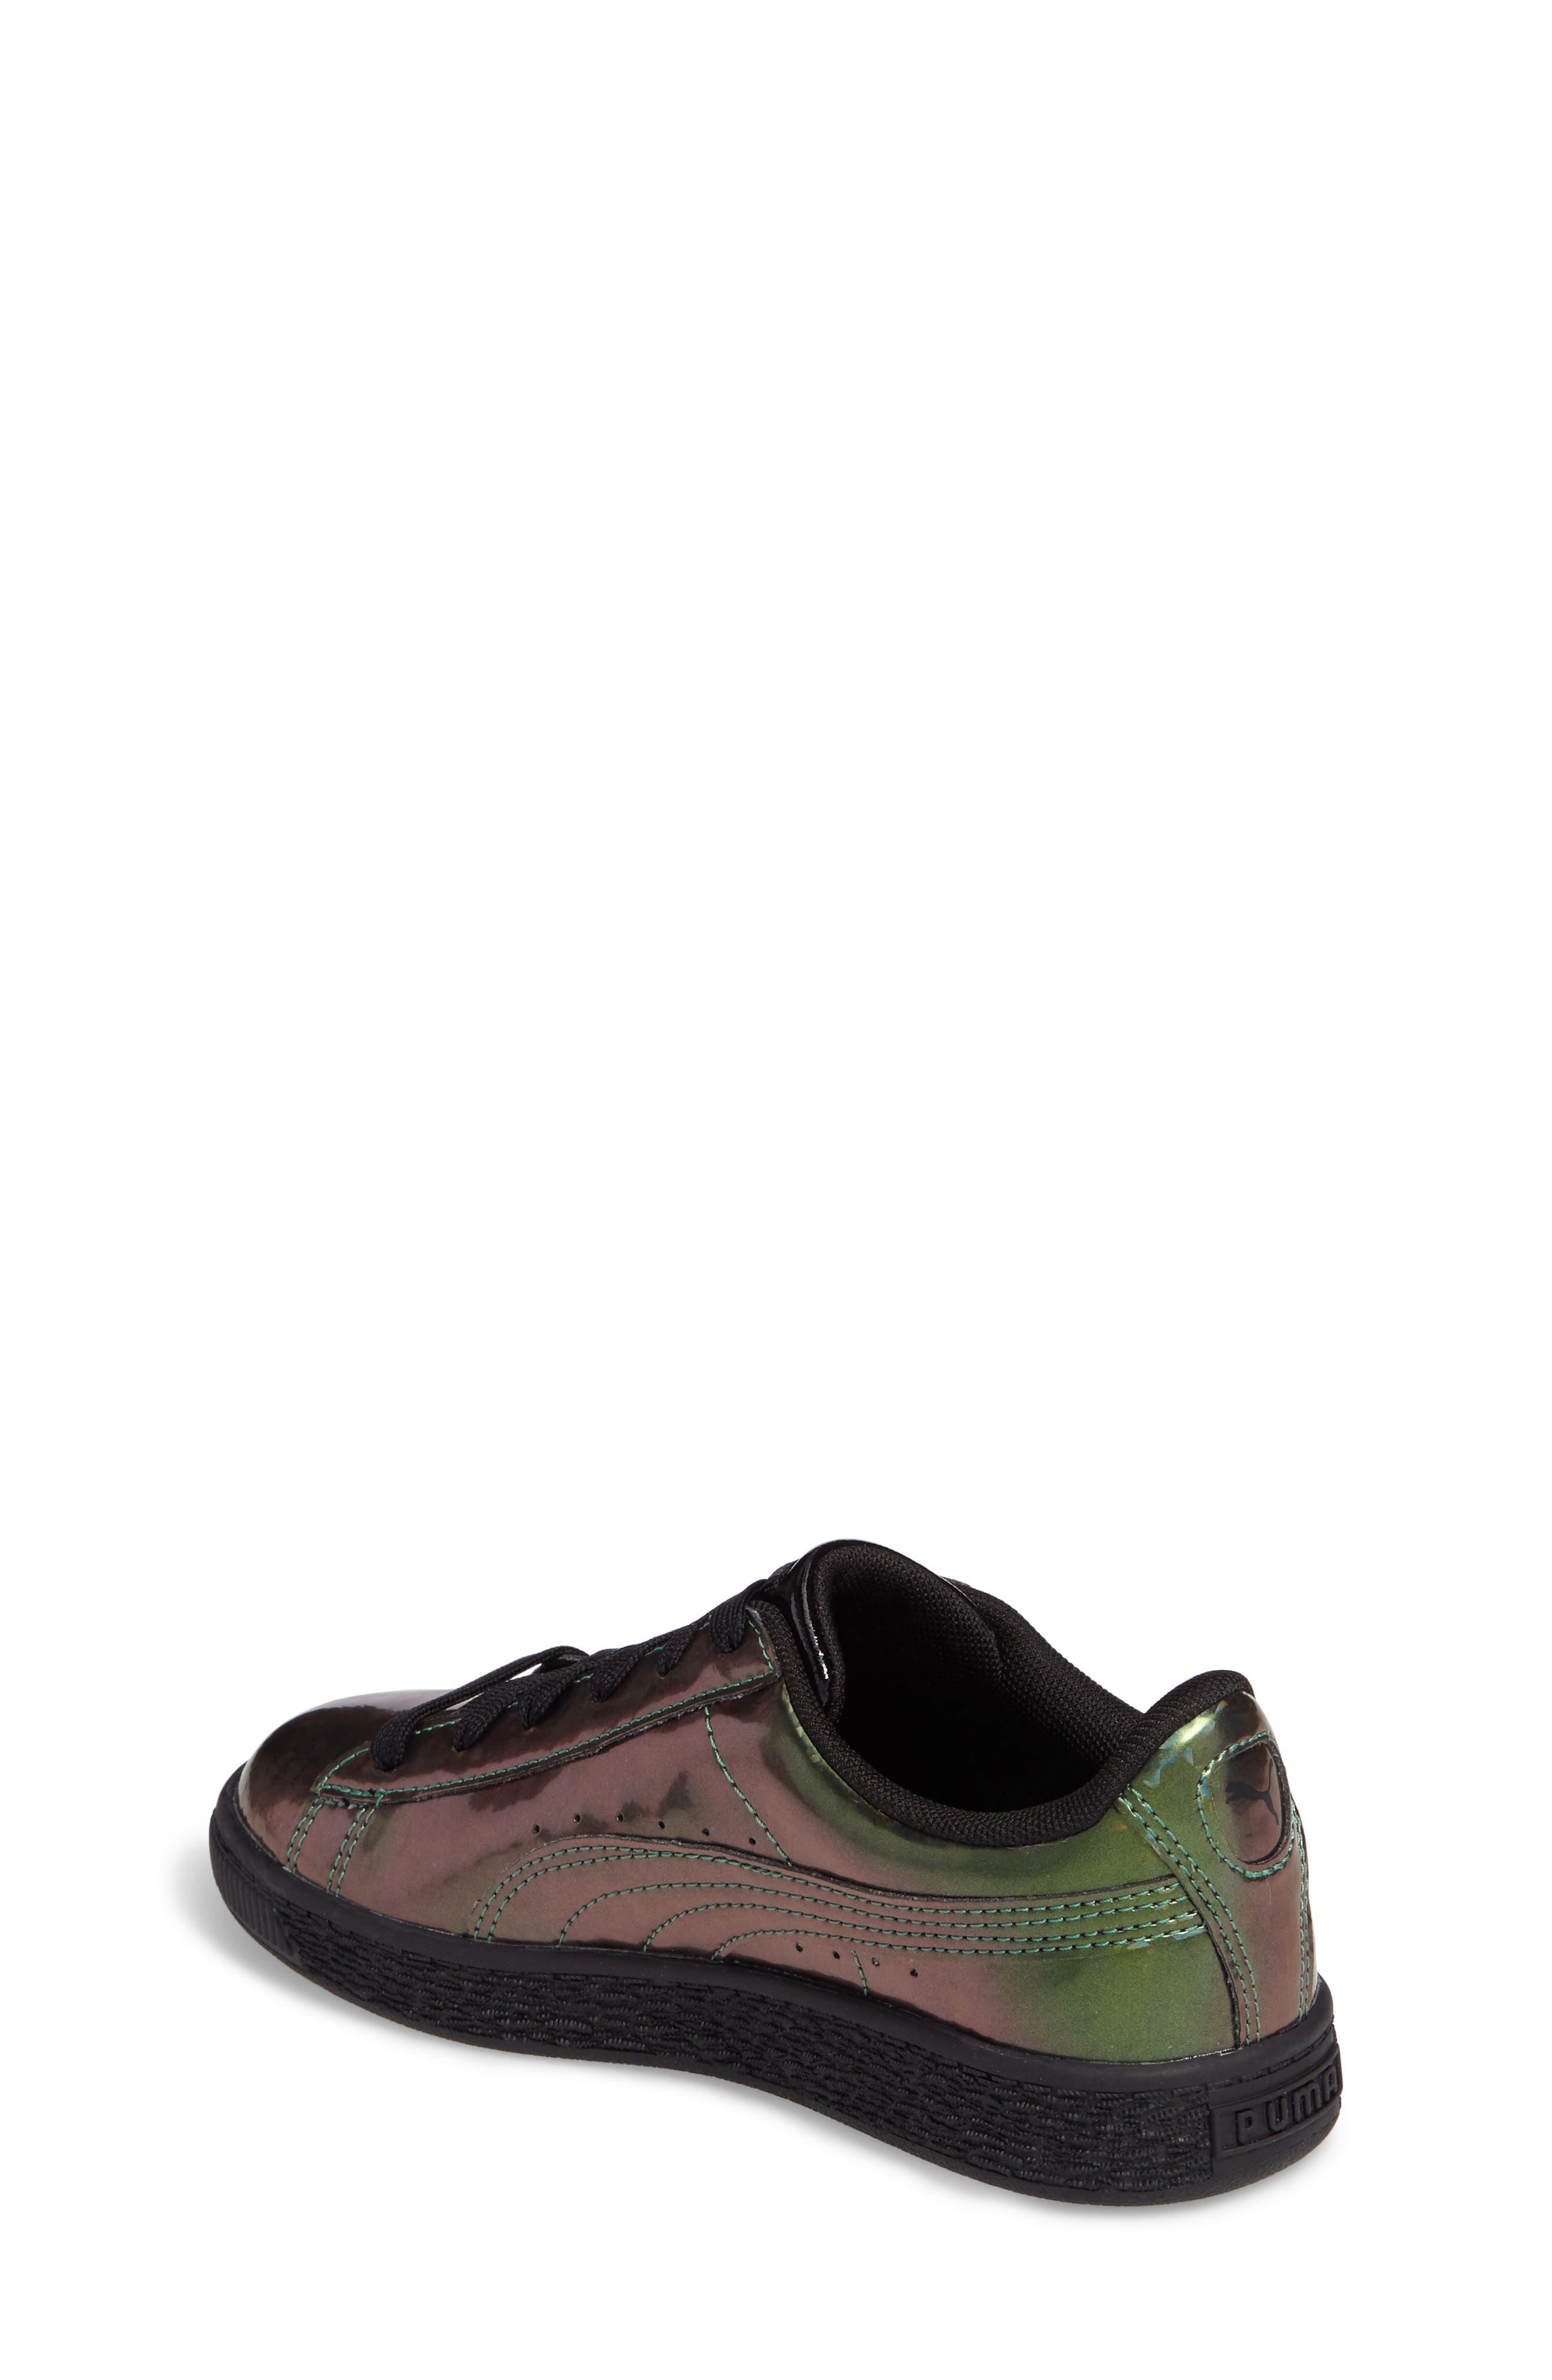 Basket Classic Holo PS Sneaker,                             Alternate thumbnail 2, color,                             Black/ Black